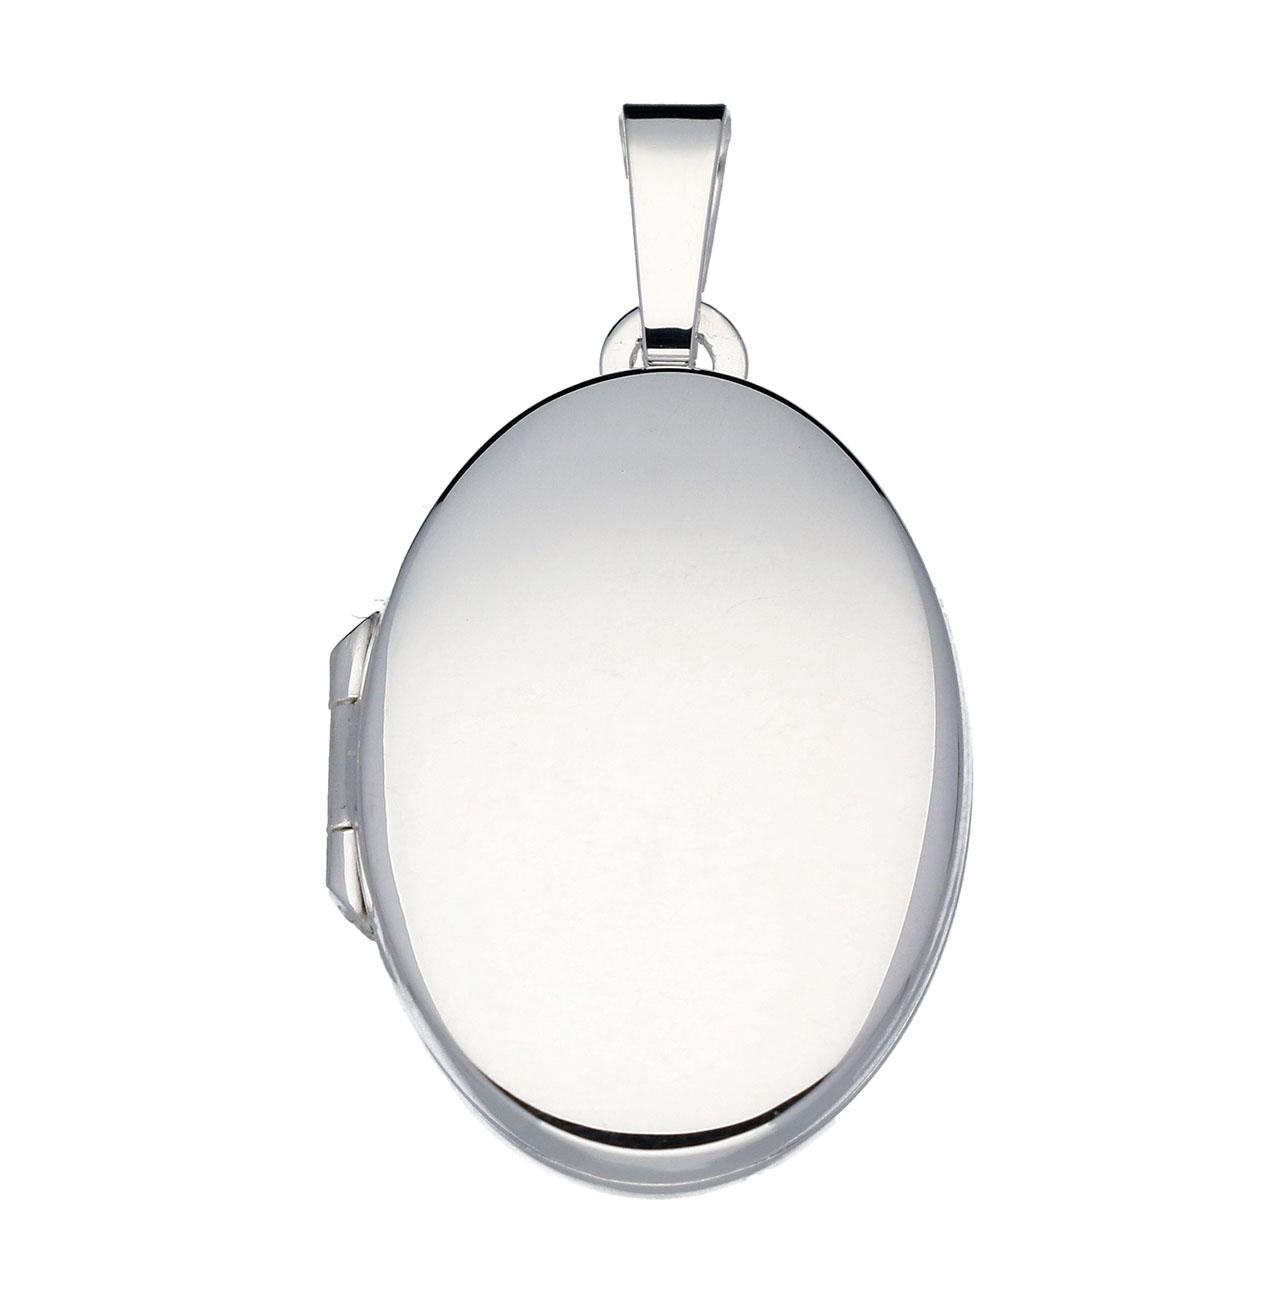 Zilveren Medaillon Ovaal - Glad 17 mm 145.0011.00